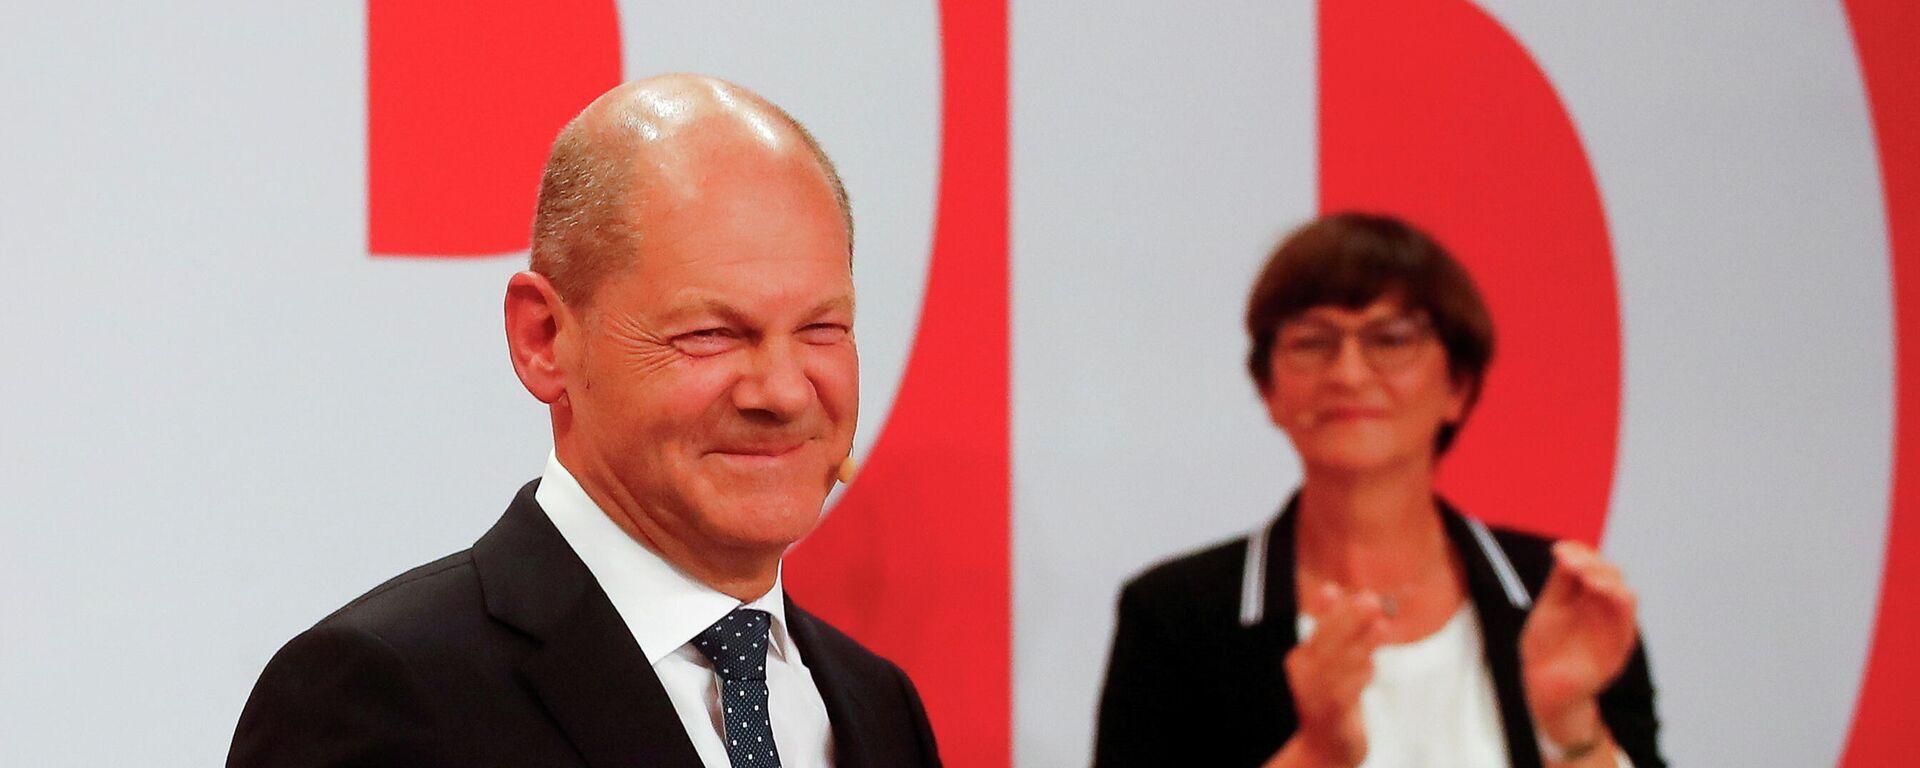 Olaf Scholz, el líder del Partido Socialdemócrata de Alemania - Sputnik Mundo, 1920, 27.09.2021